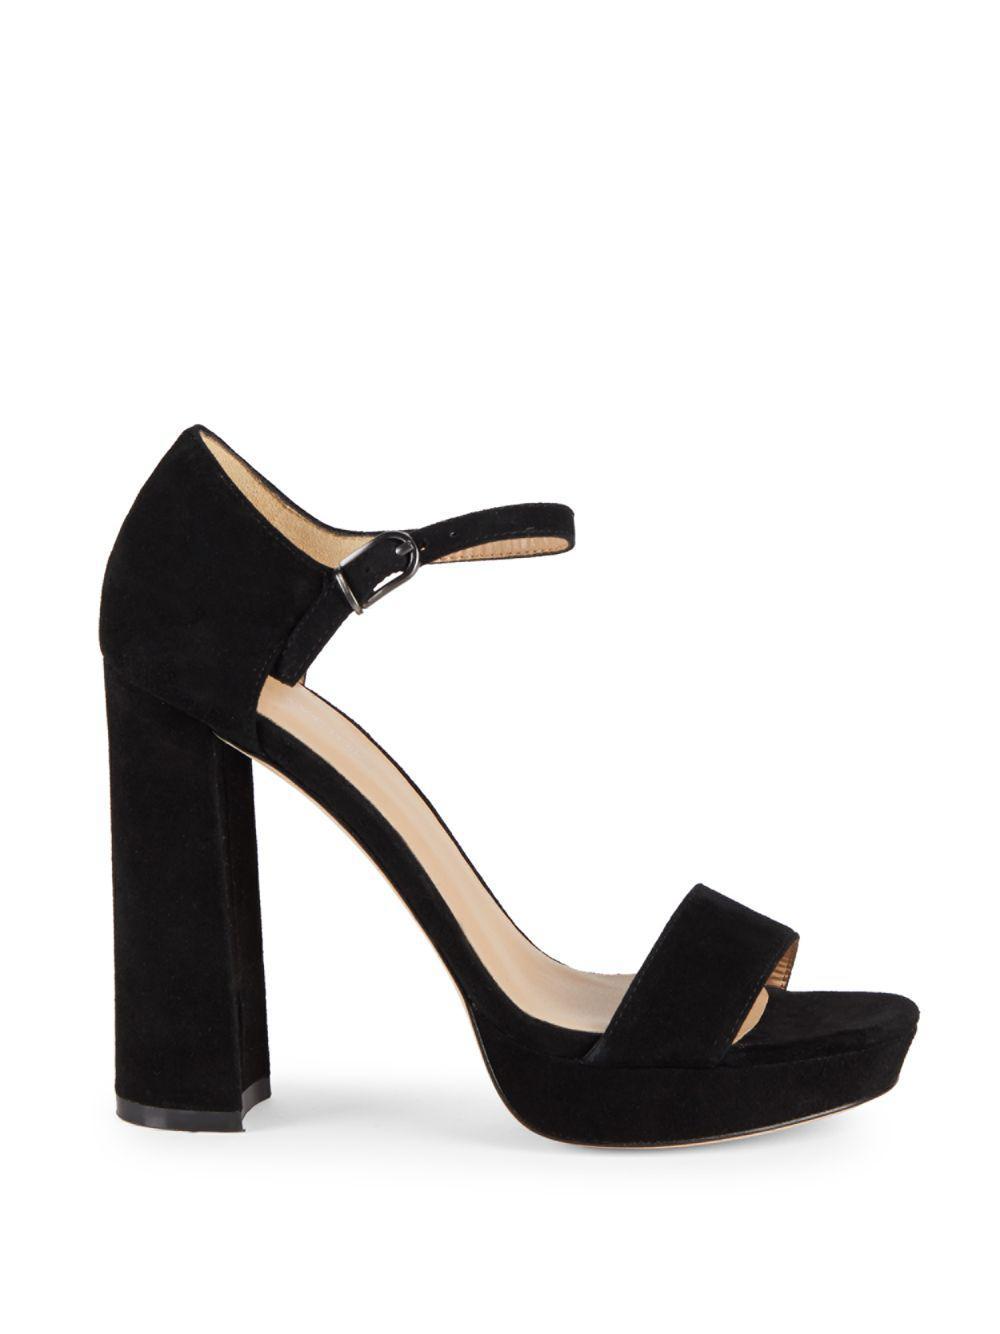 e52e77c45126fa Lyst - Pour La Victoire Yvette Block Heel Leather Sandals in Black